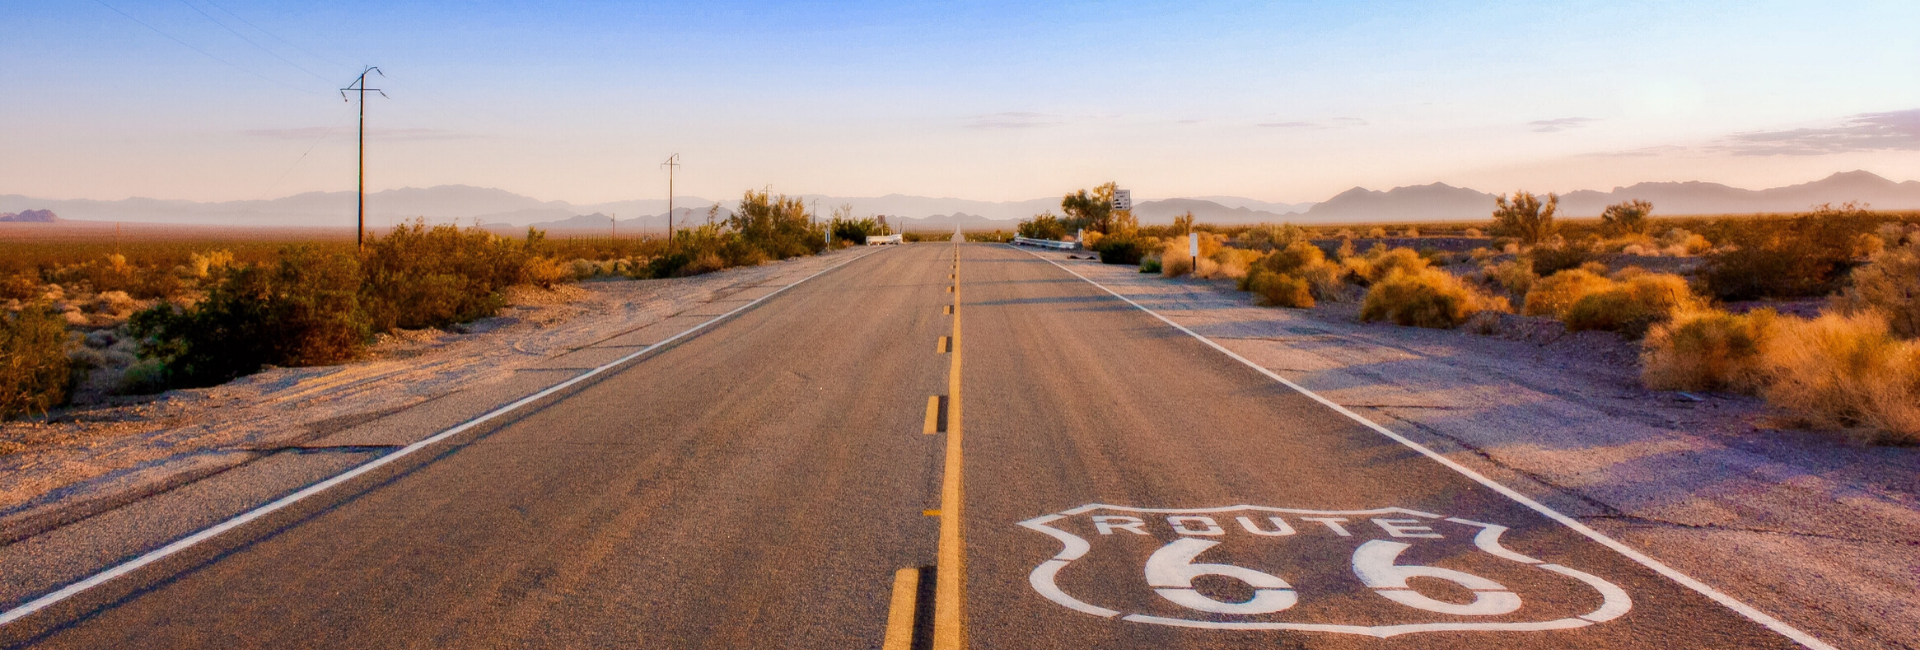 Route 66 Best Driving Roads in America